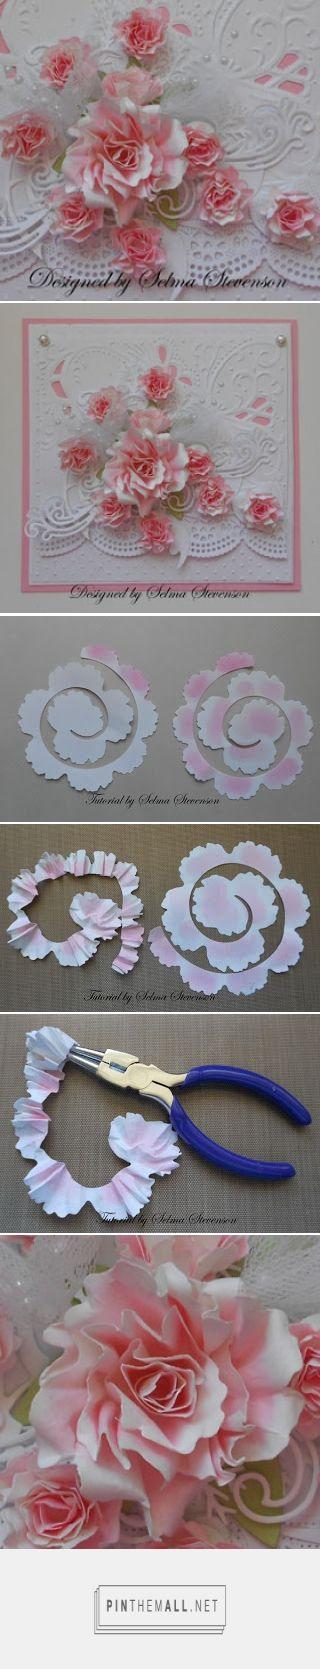 25 best ideas about paper flower tutorial on pinterest for Handmade paper flowers tutorial